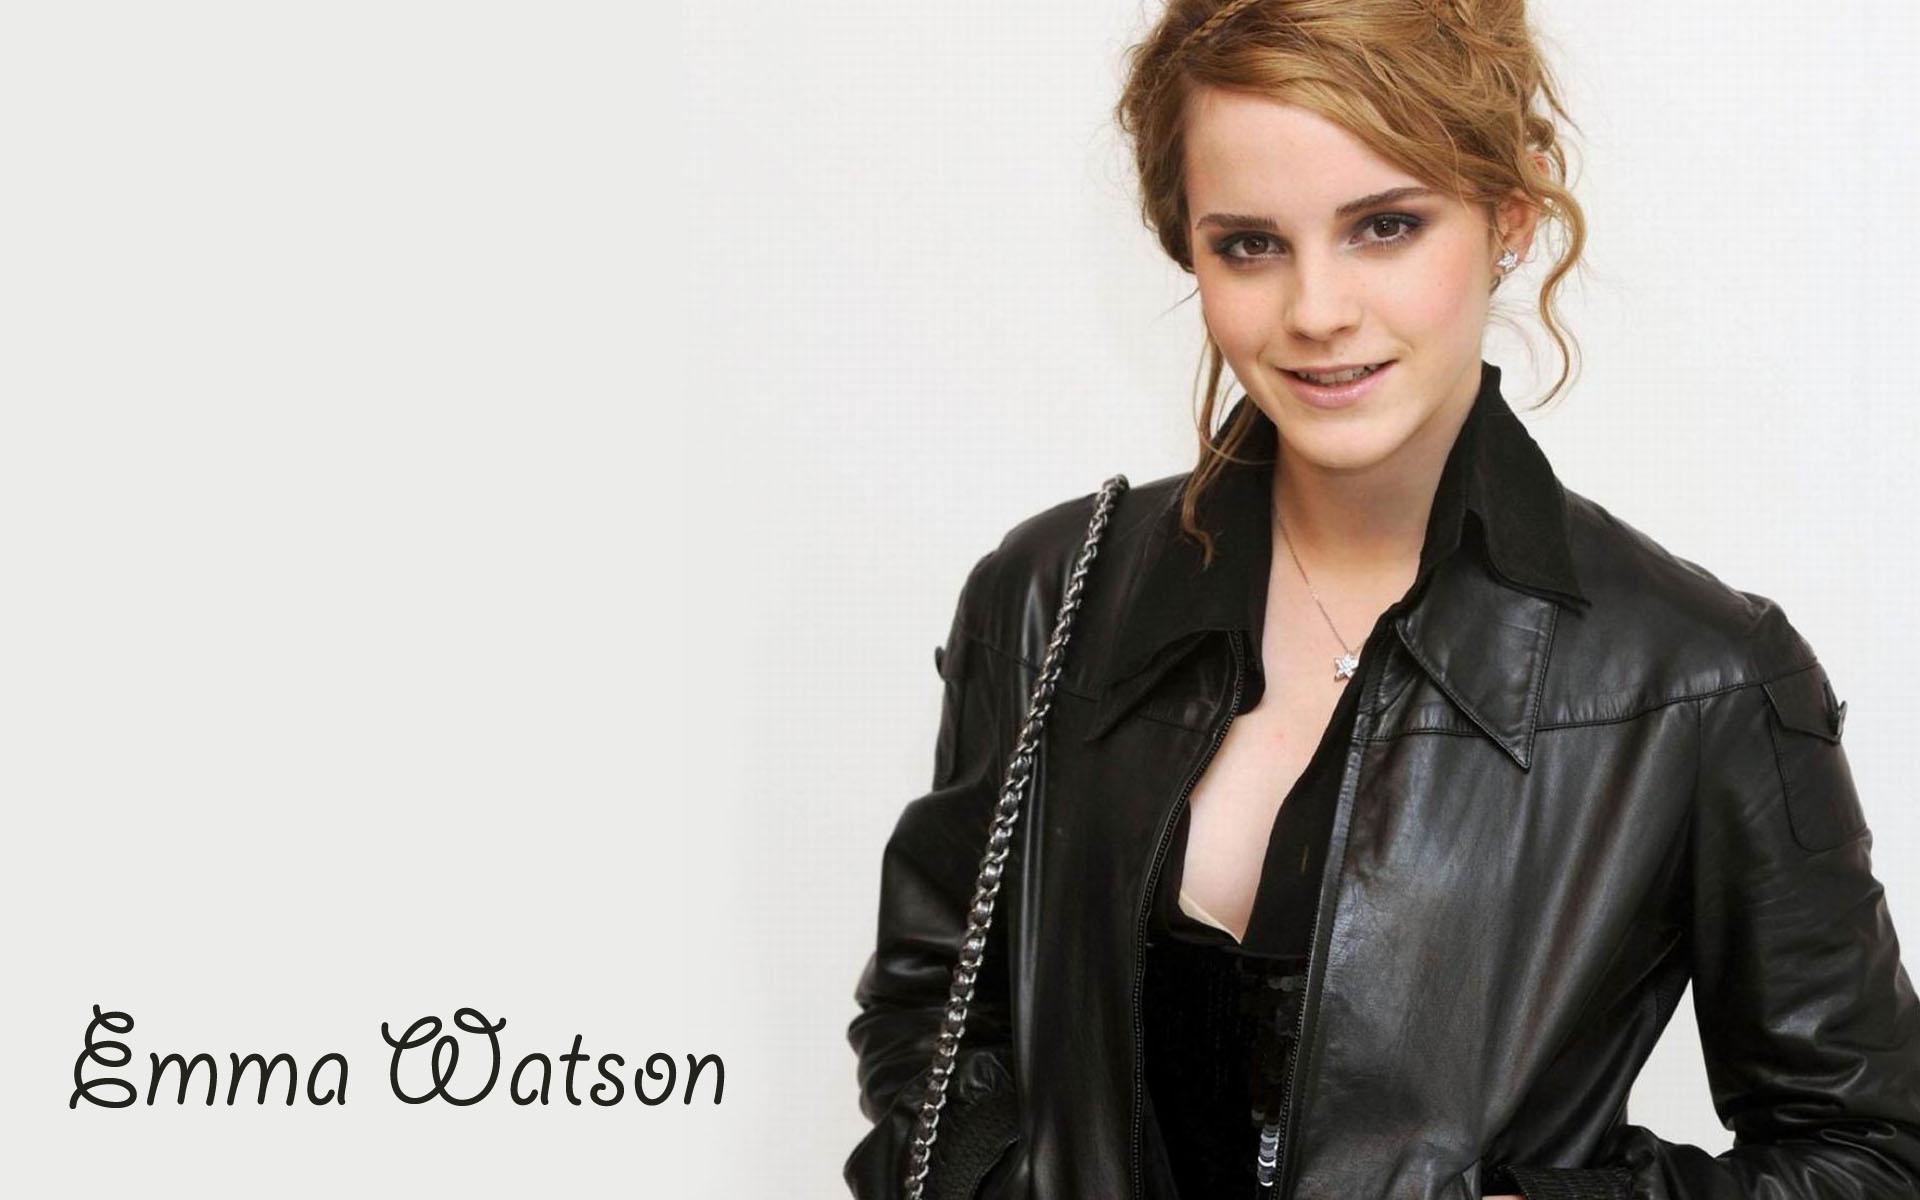 Emma Watson HD Wallpapers Images FemaleCelebrity 1920x1200